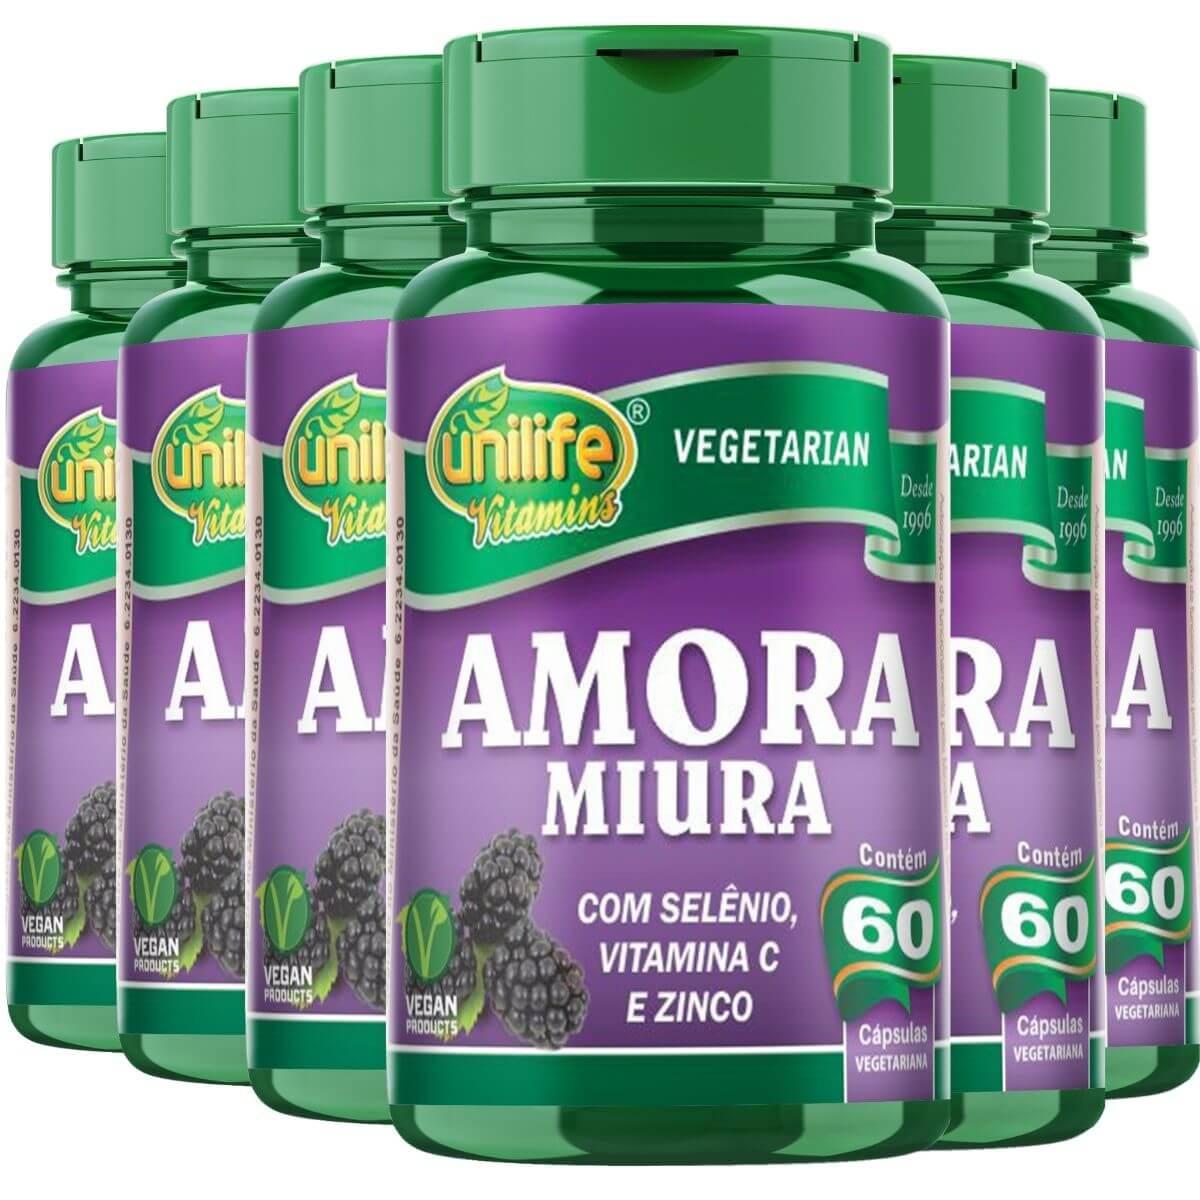 Kit 6 Amora Miura Vitaminas e Mineral - 500mg 60 Capsulas - Unilife